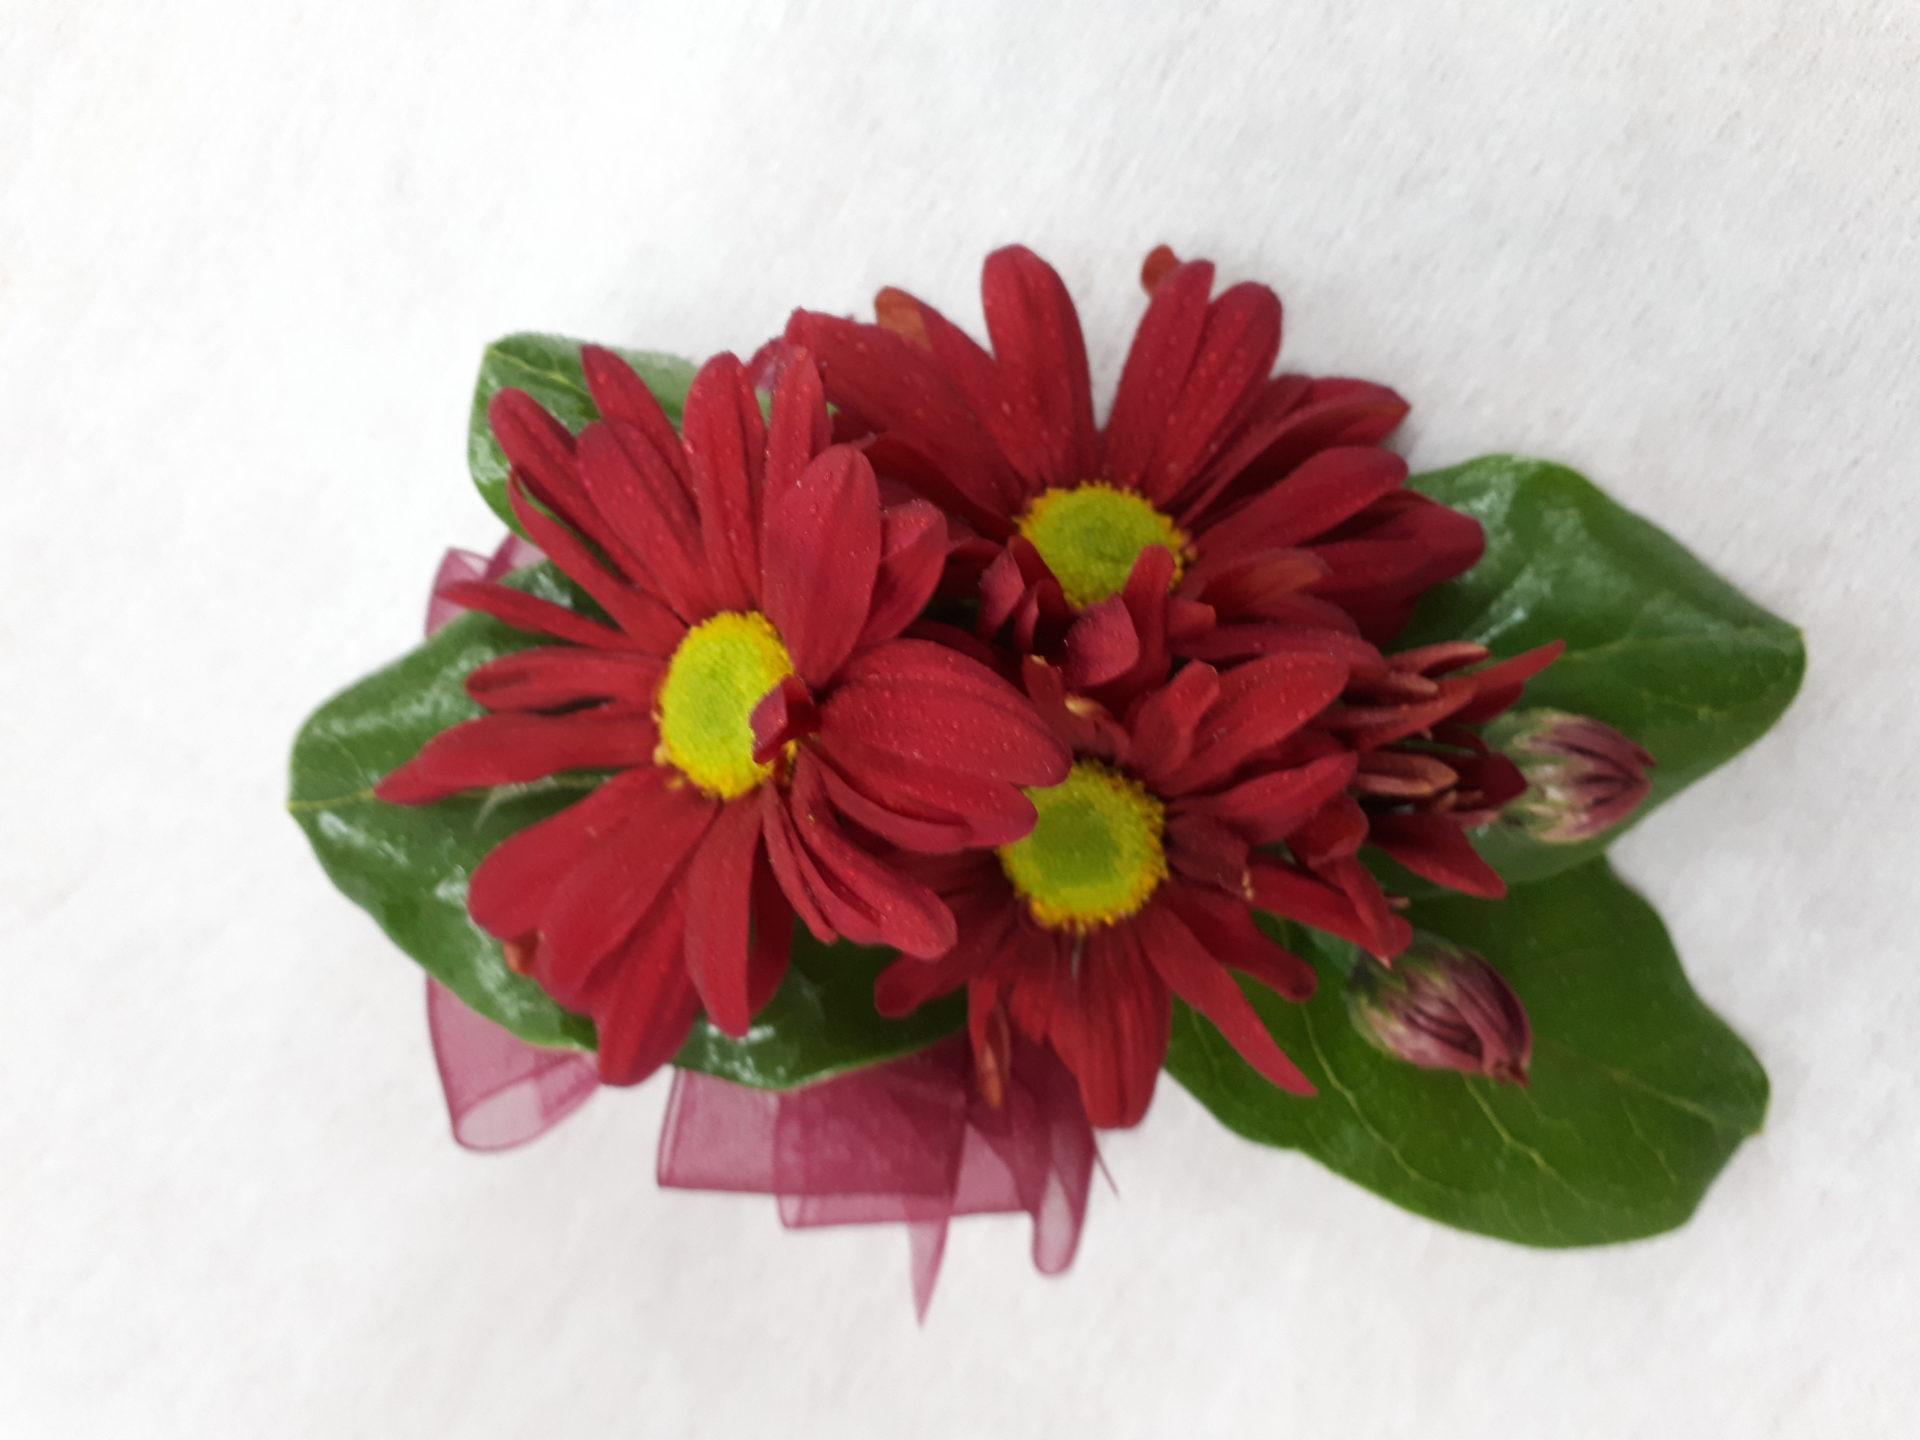 Burgundy daisy corsage